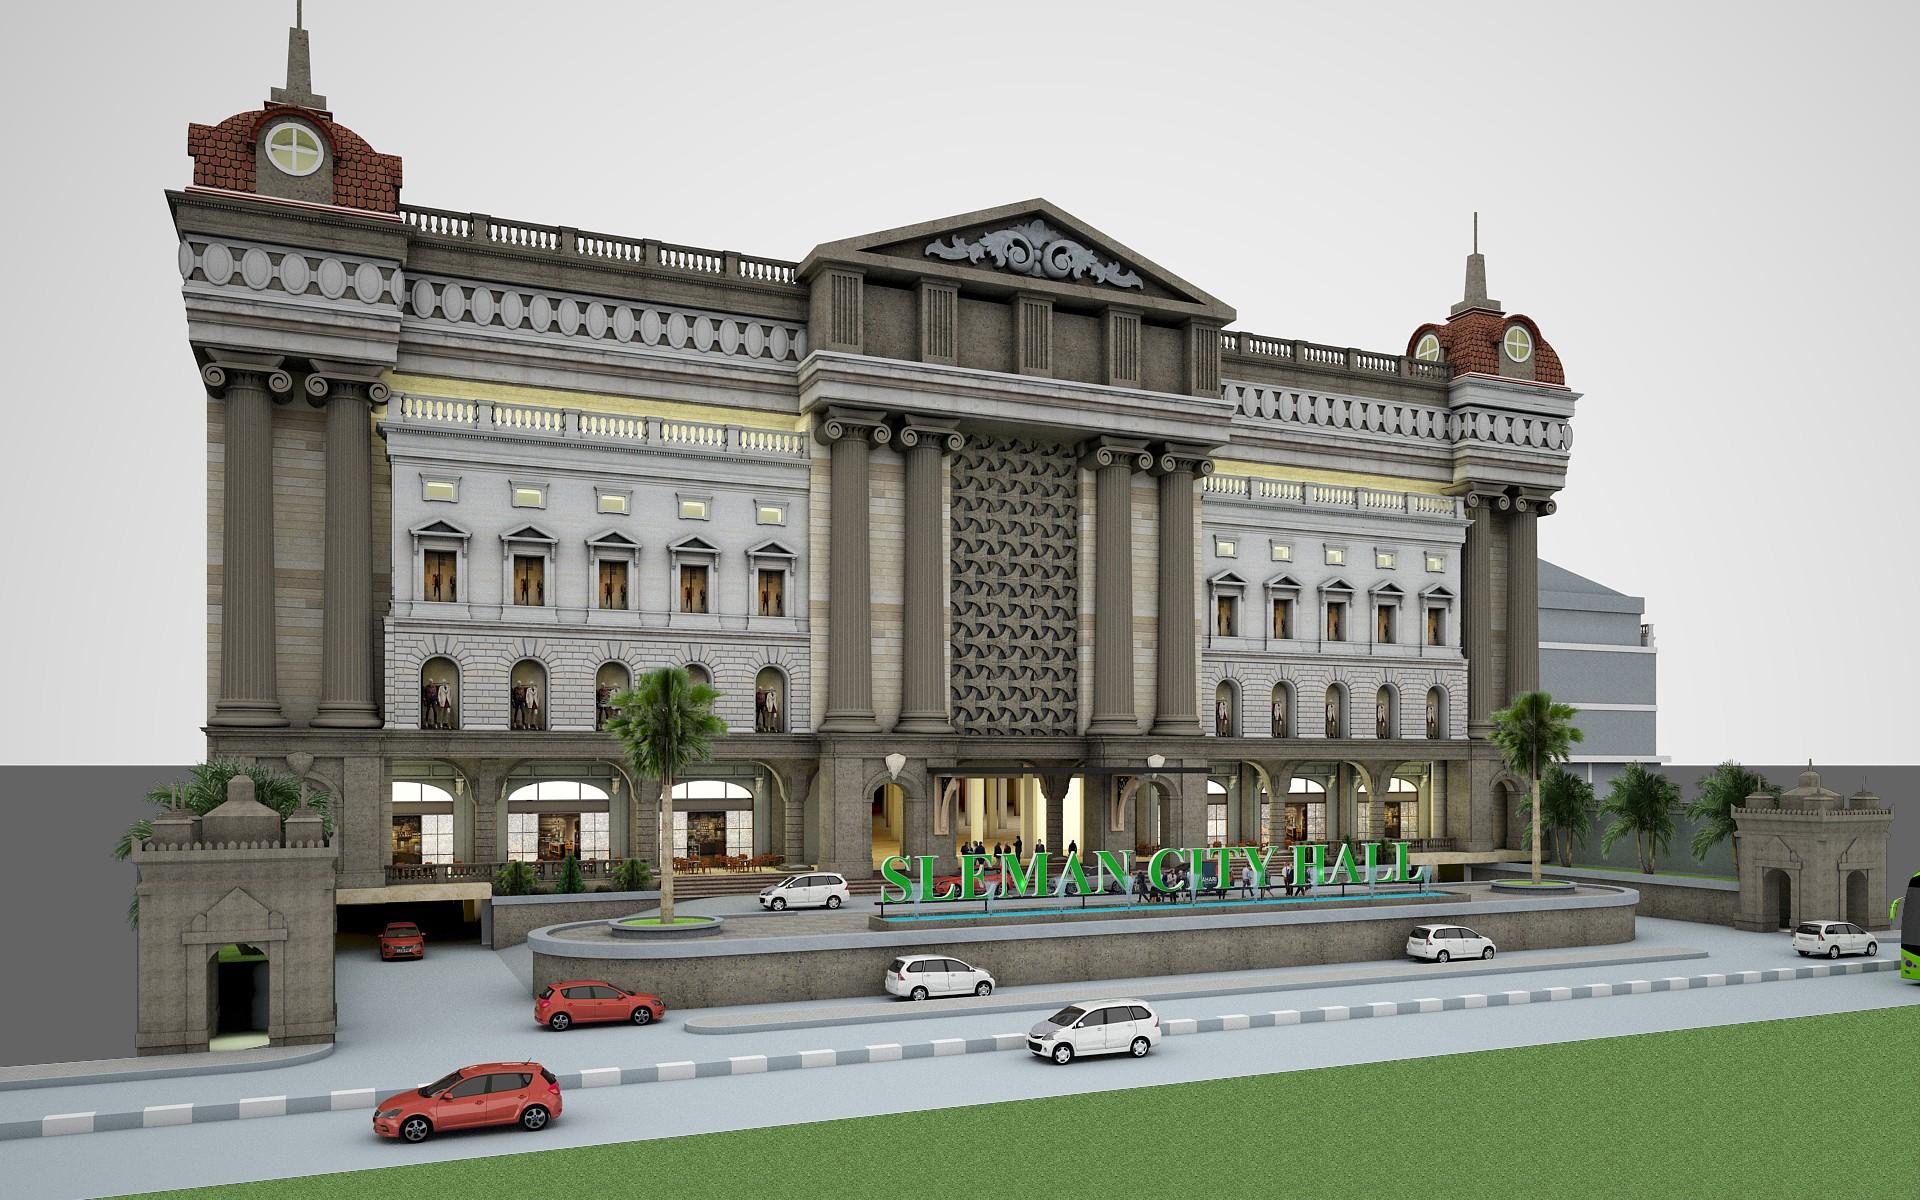 Jadwal bioskop xxi sleman city hall